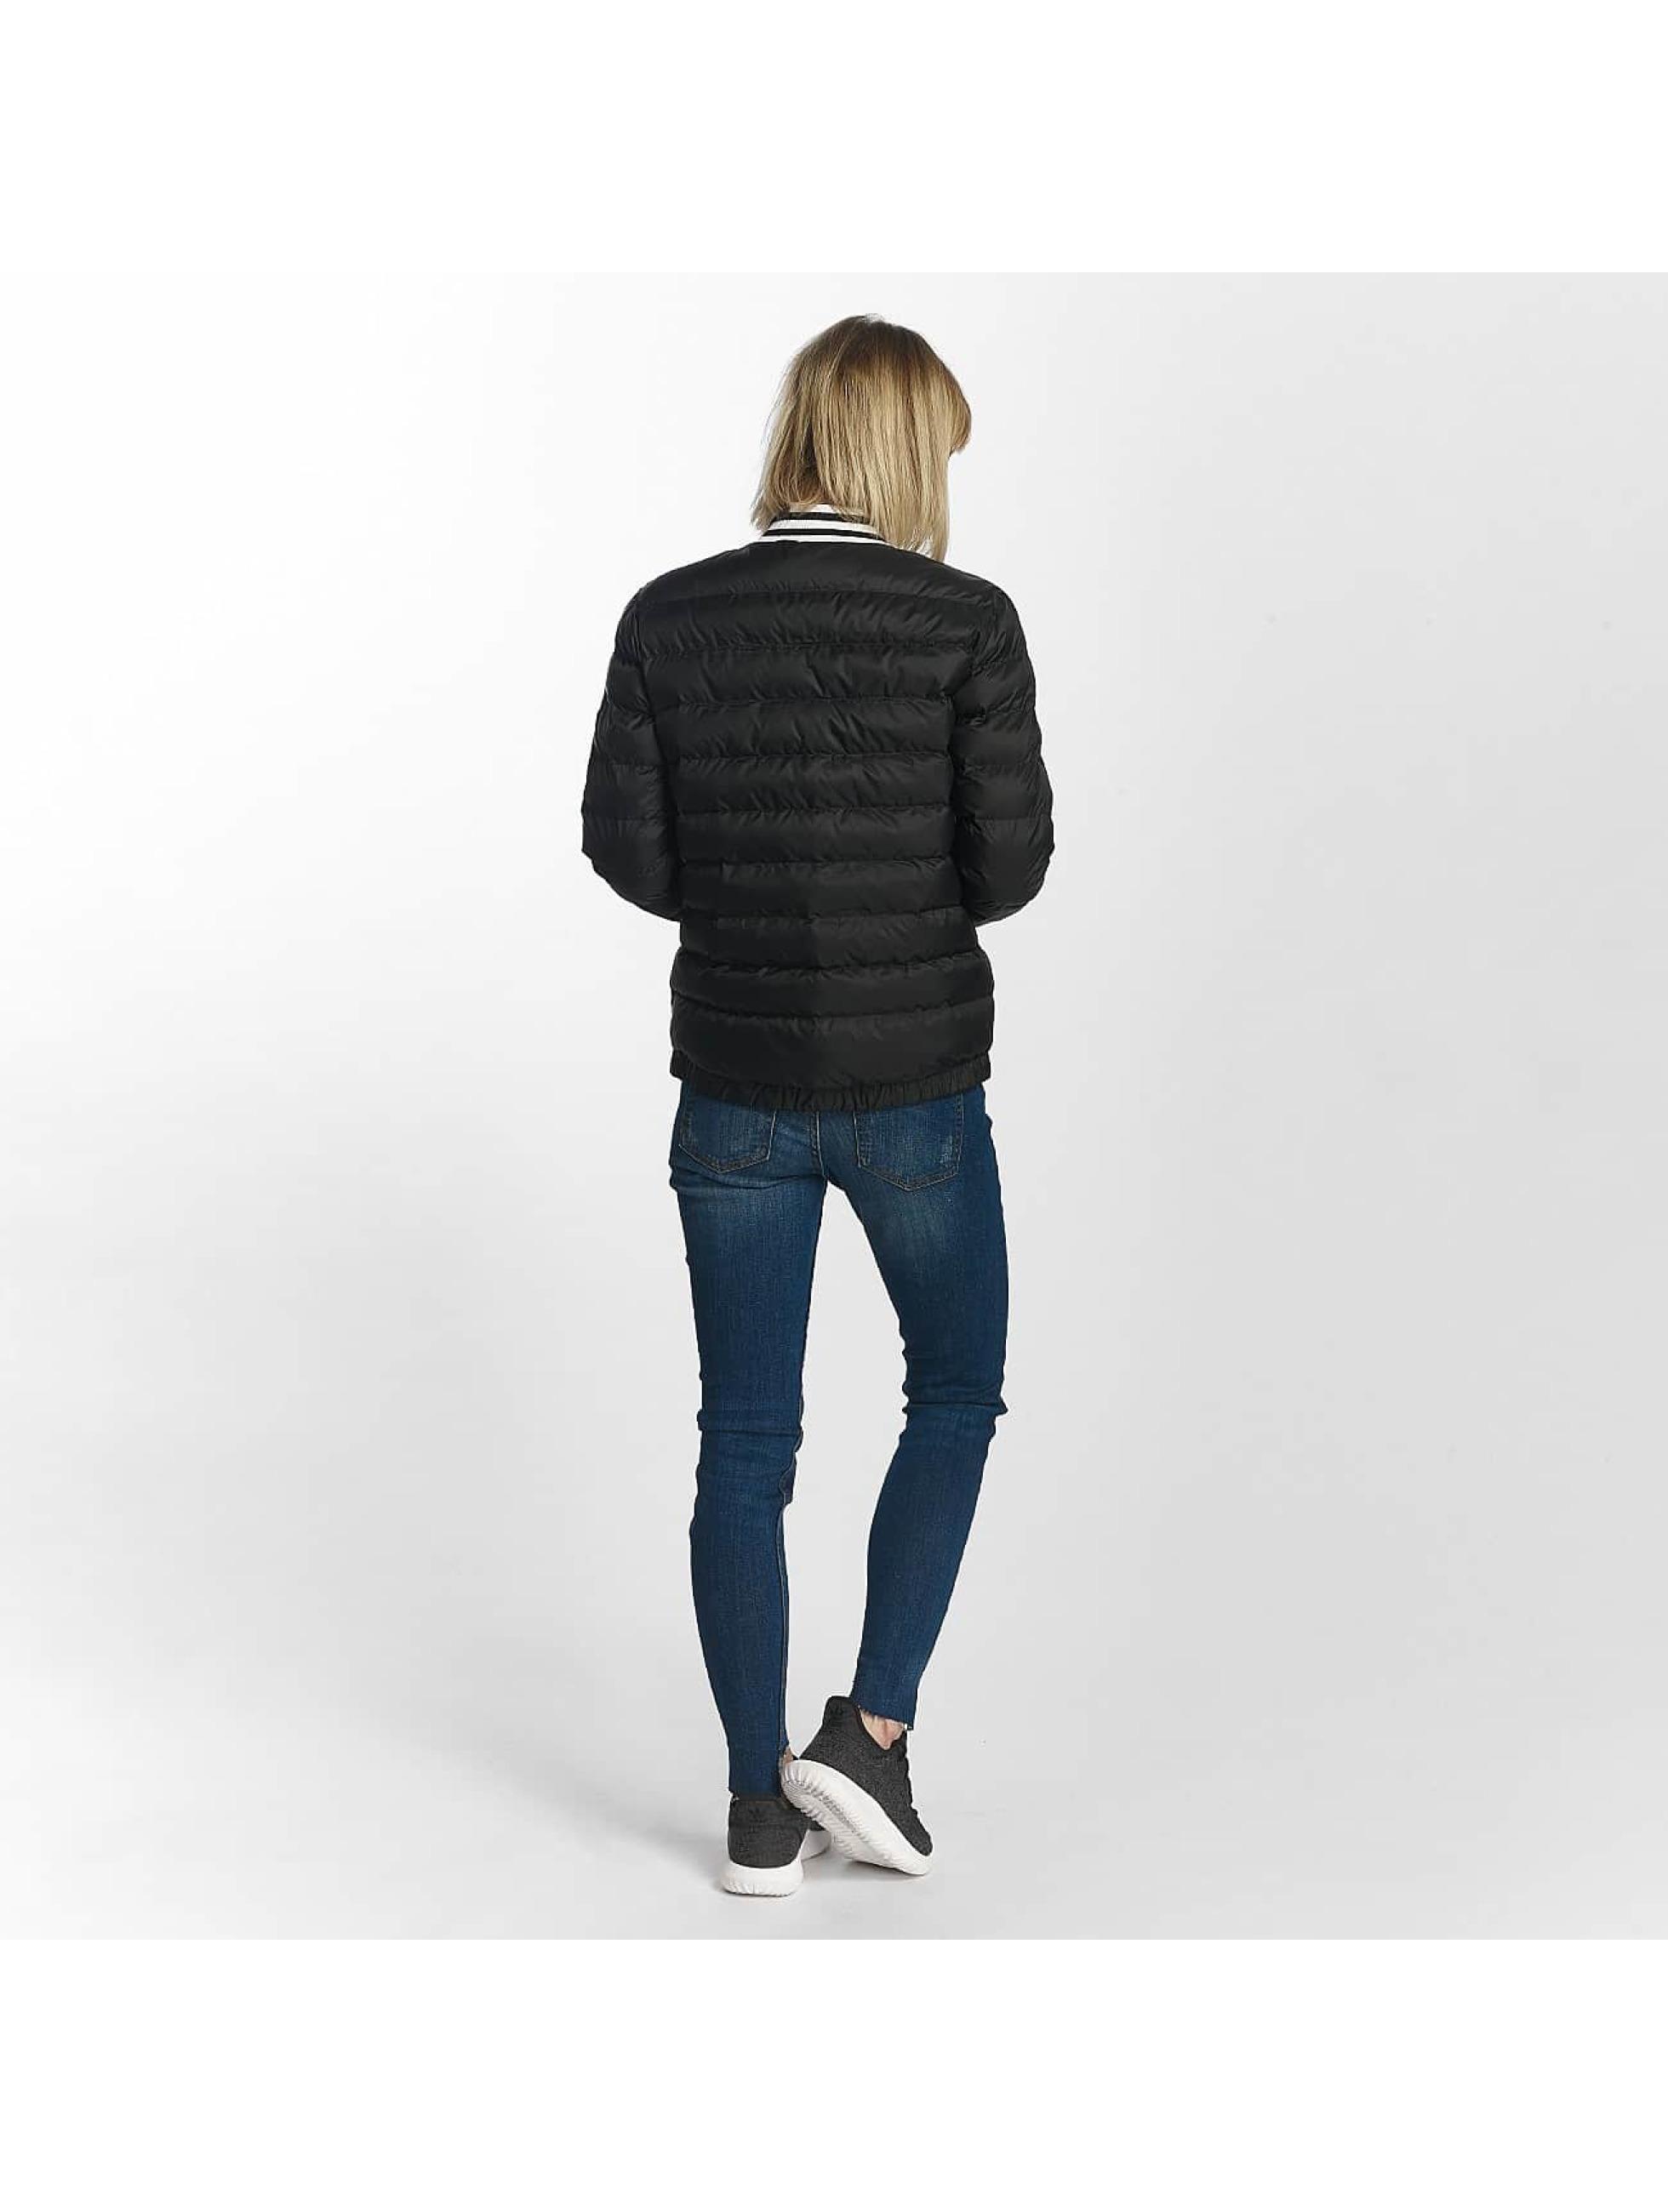 adidas Winterjacke Blouson schwarz